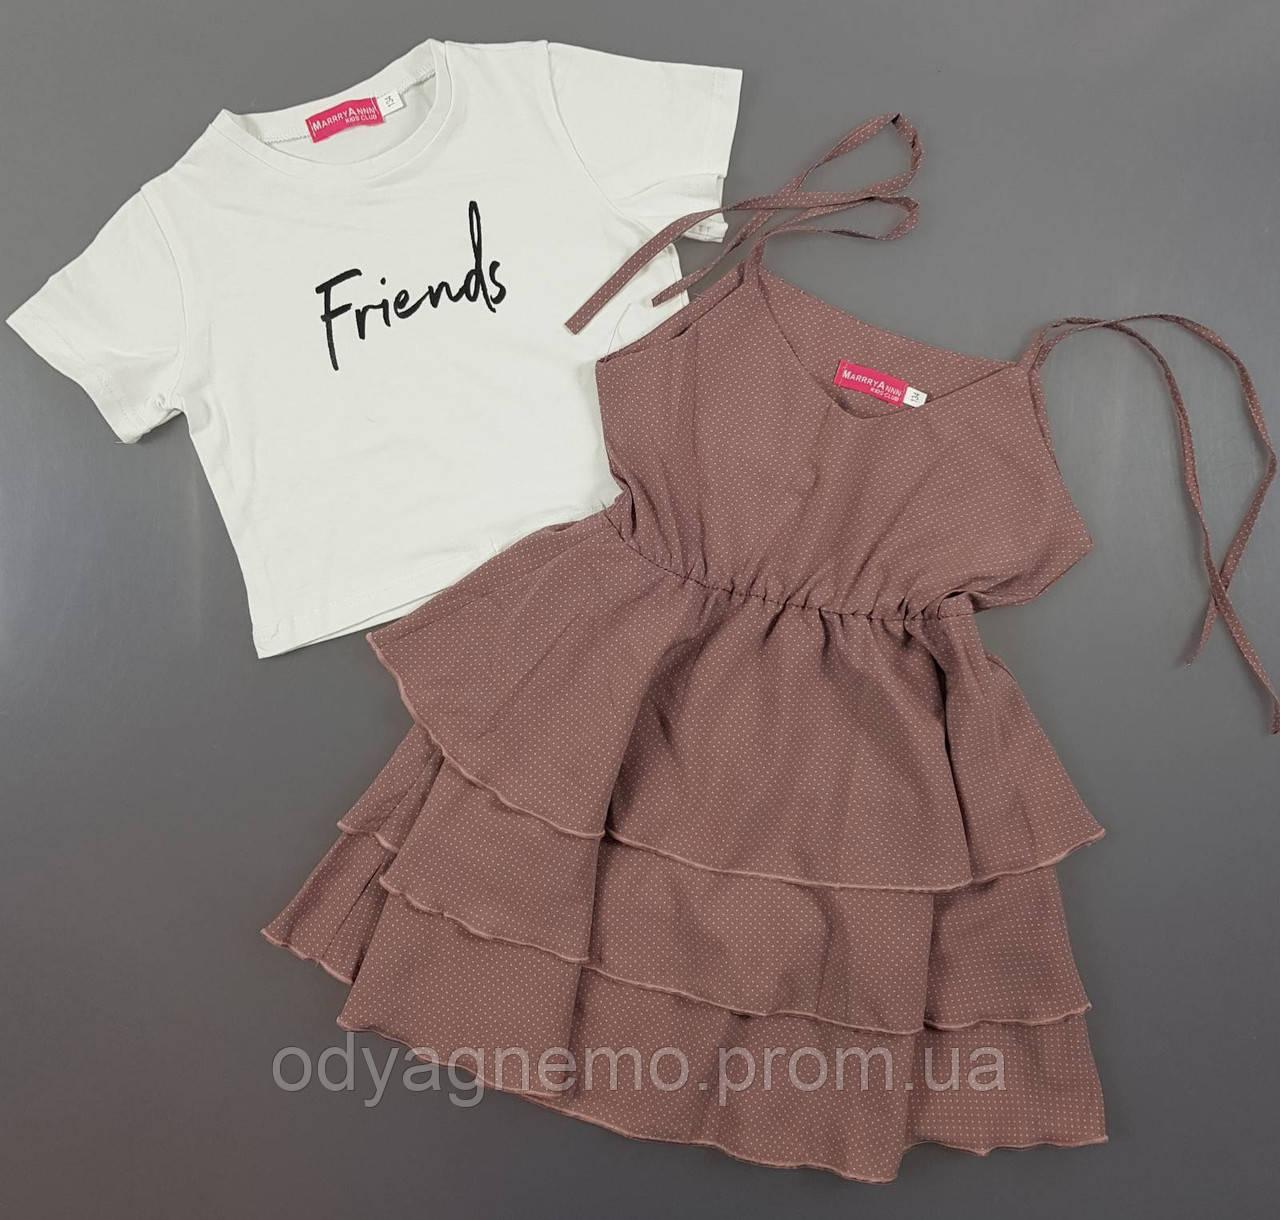 Комплект Friends для девочек, 134-158 рр. Артикул: MA862-грязно розовый